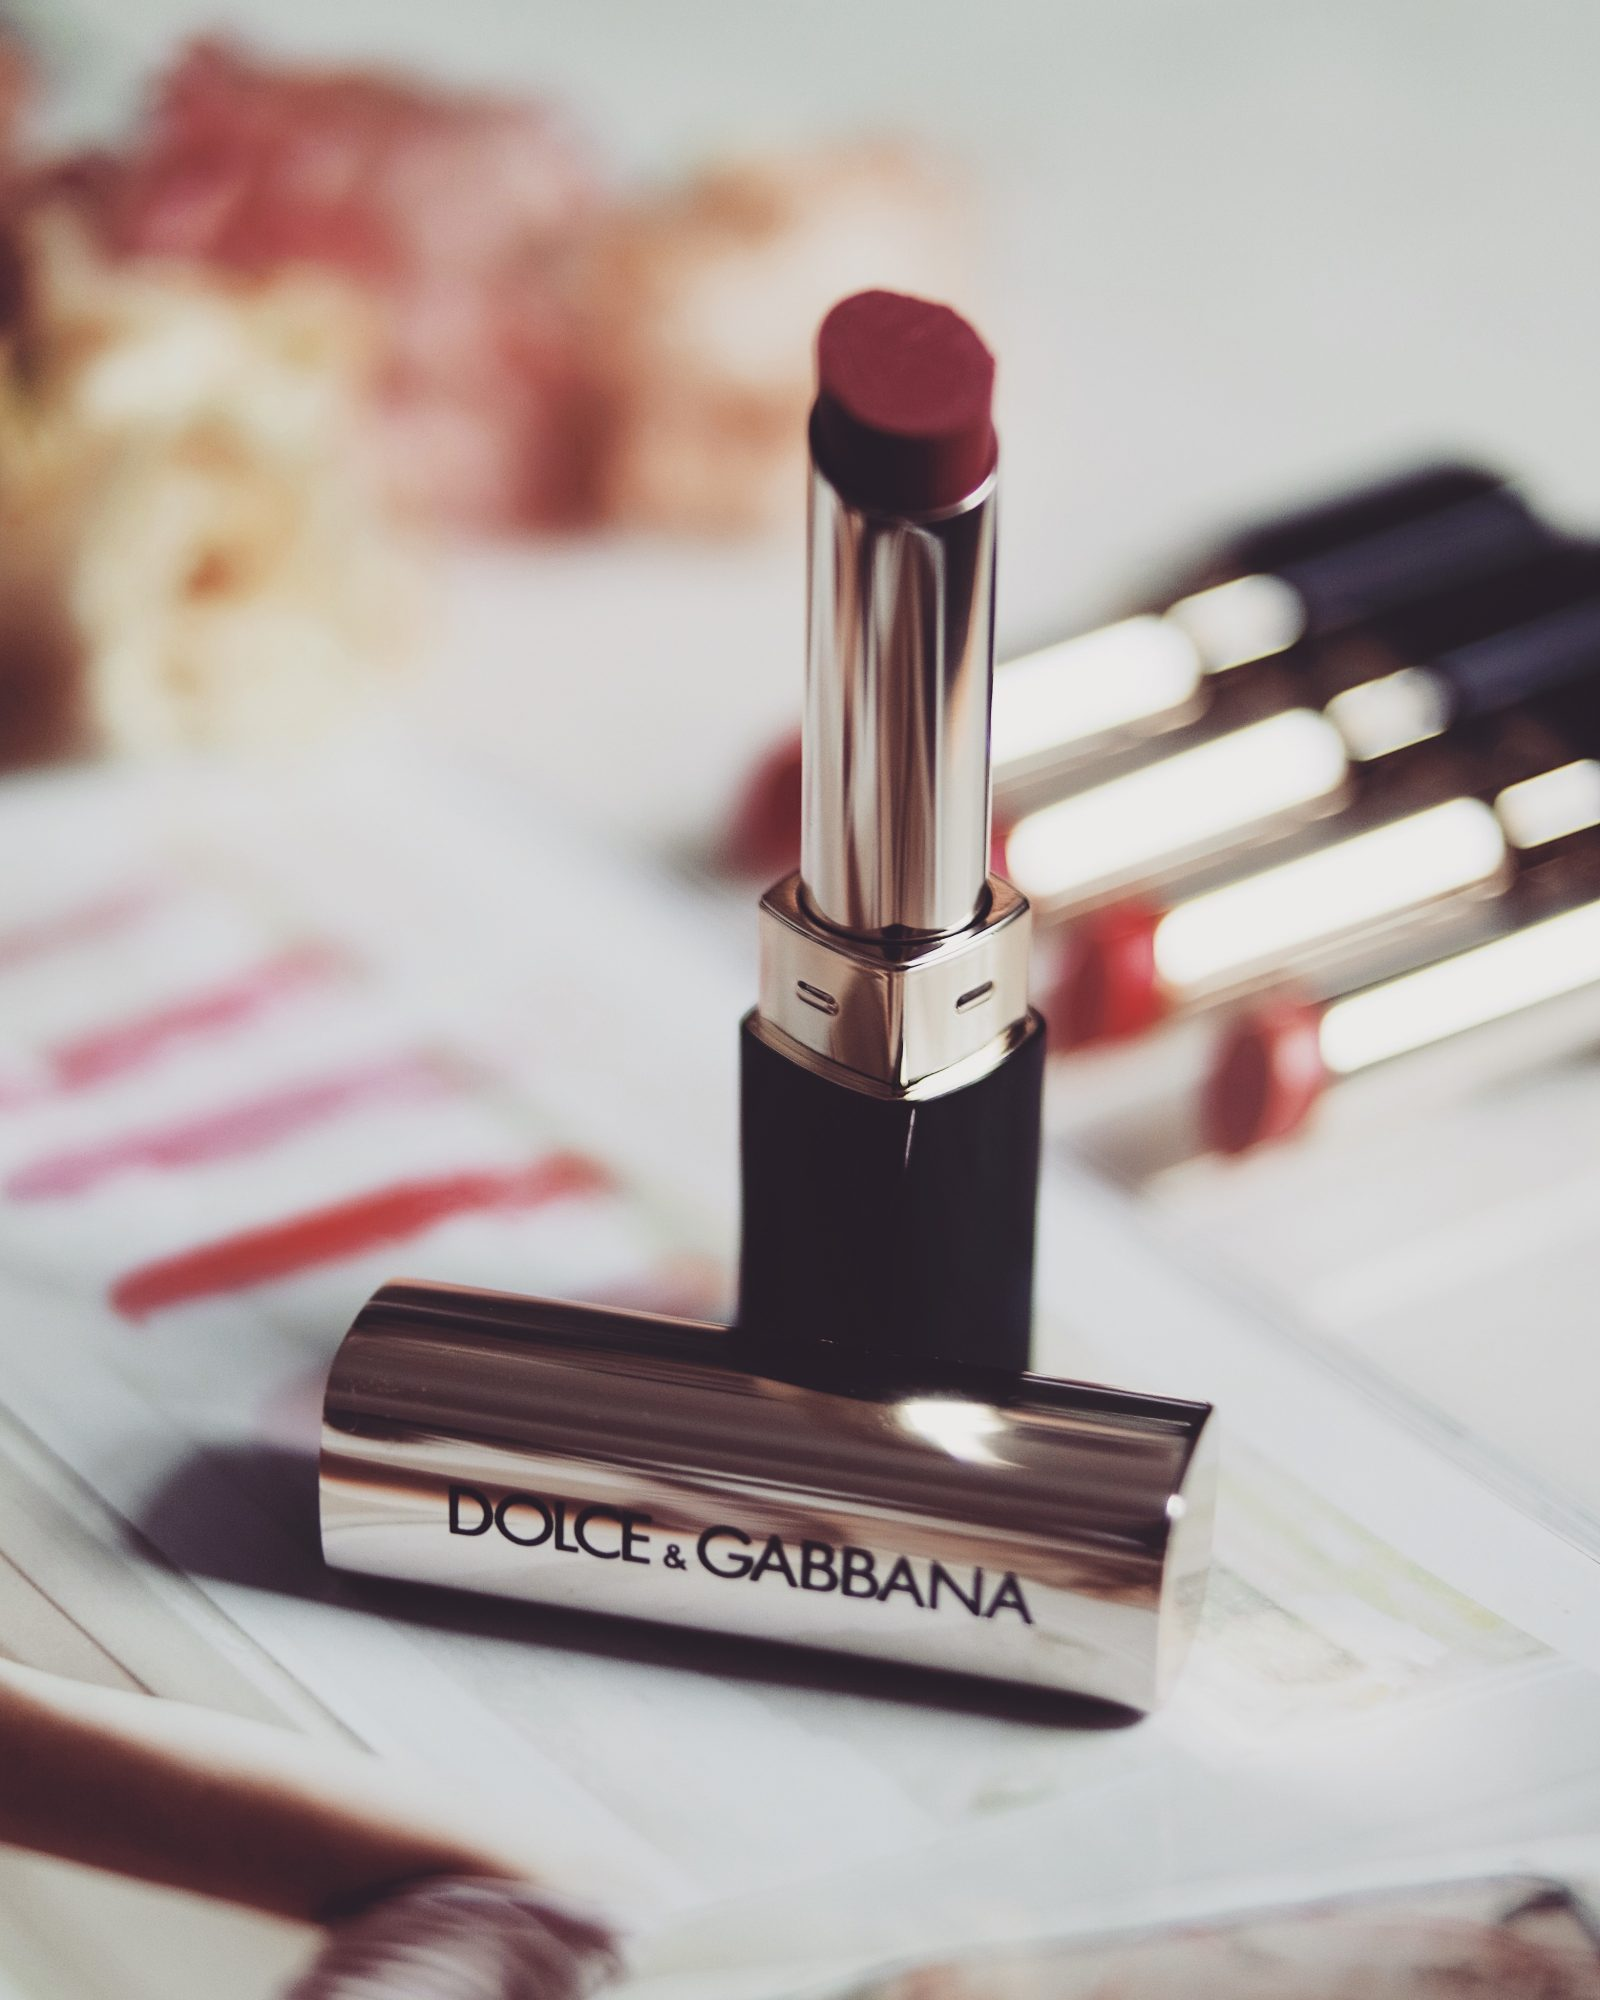 Dolce & Gabbana - Miss Sicily Domenica